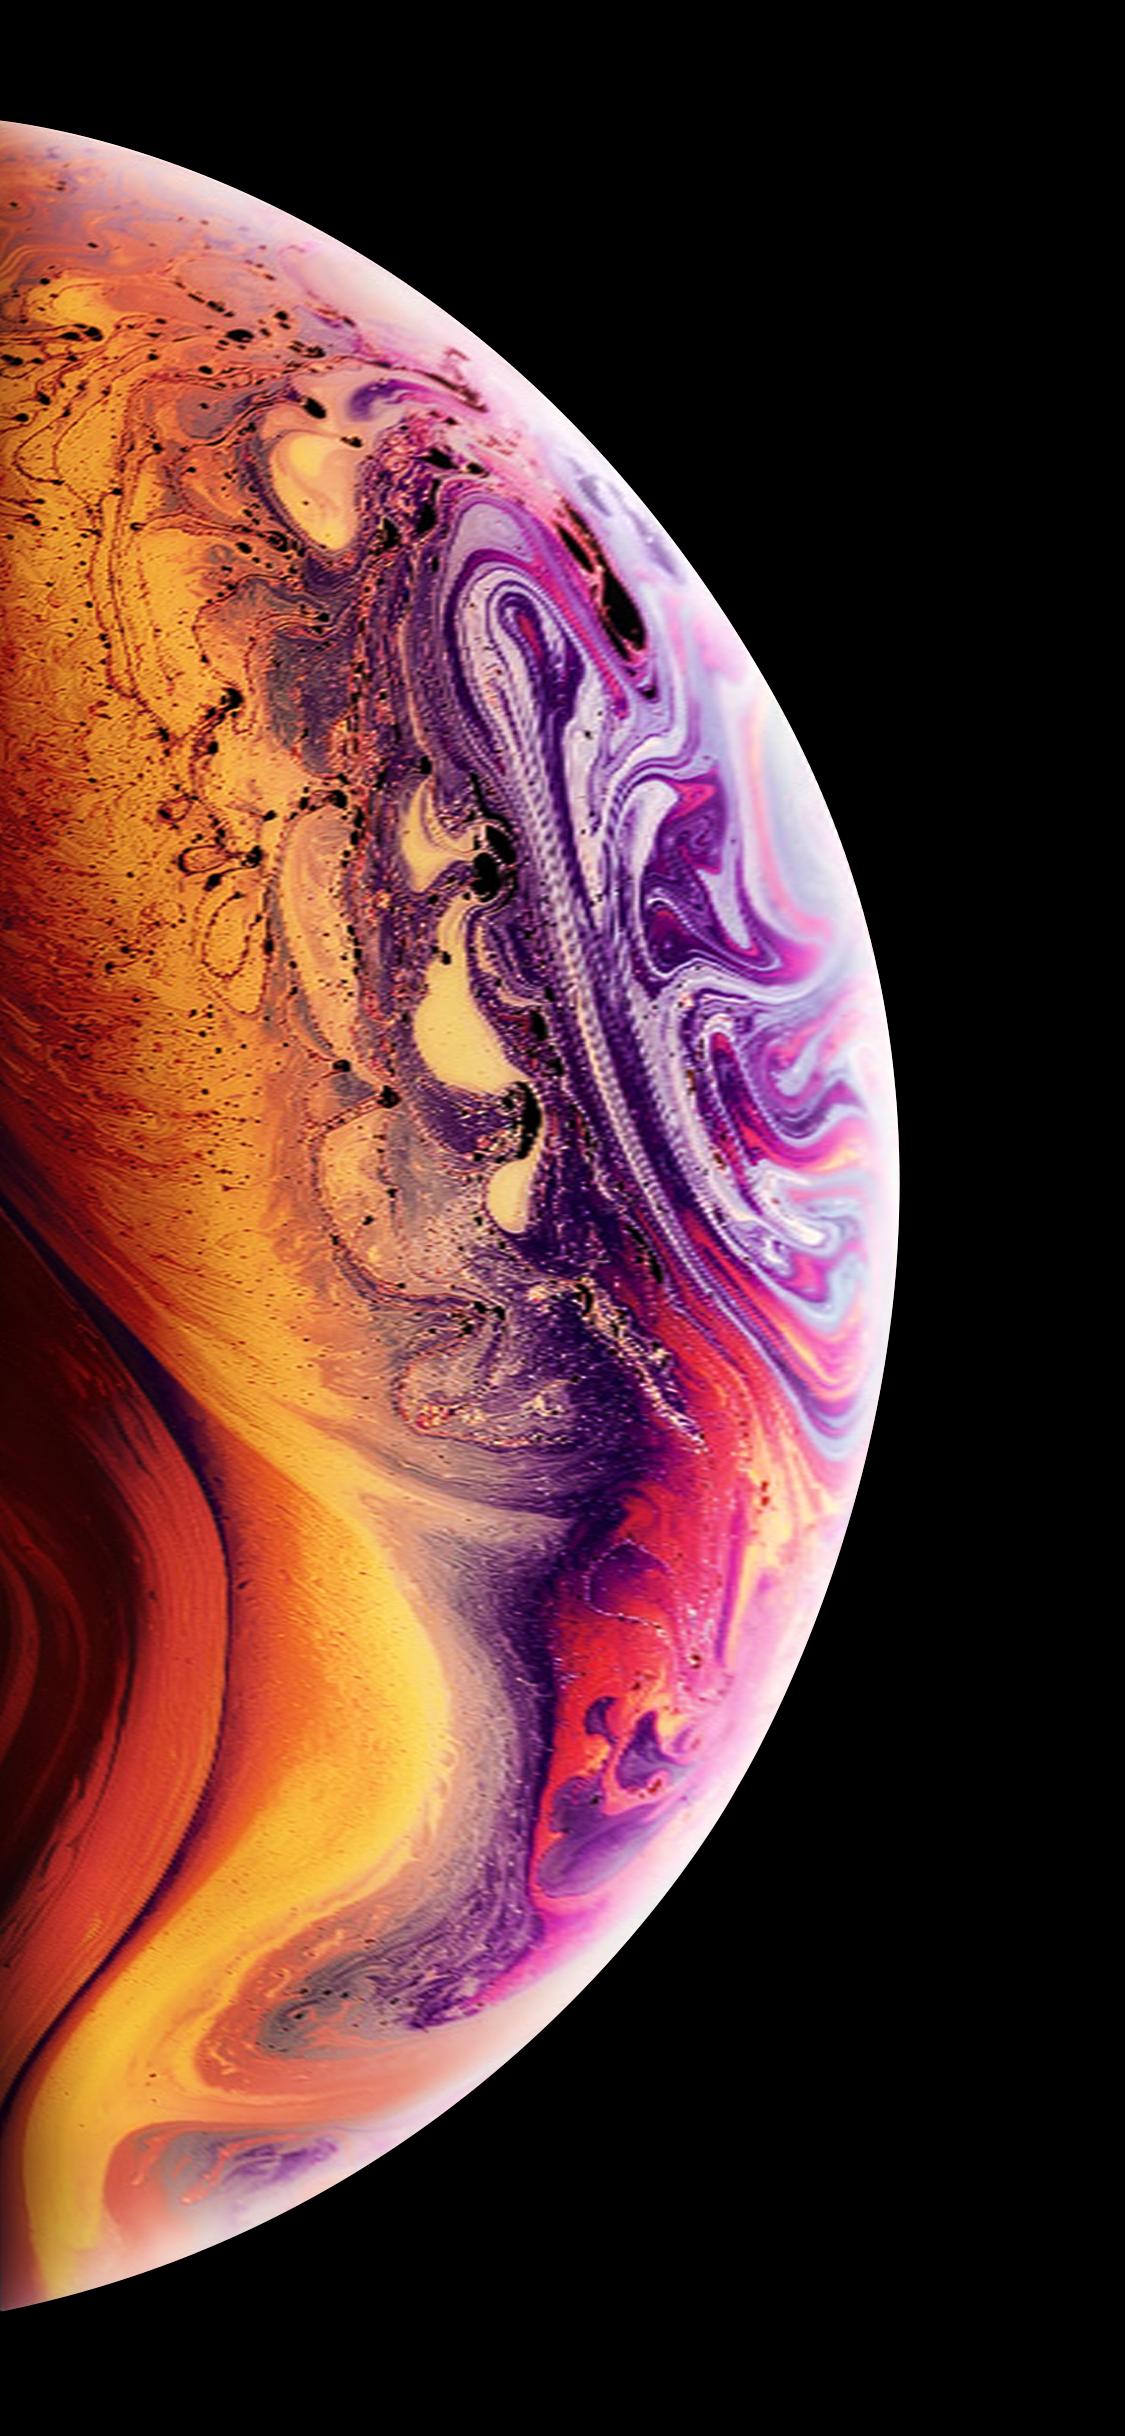 iPhone XS 木星壁纸分享